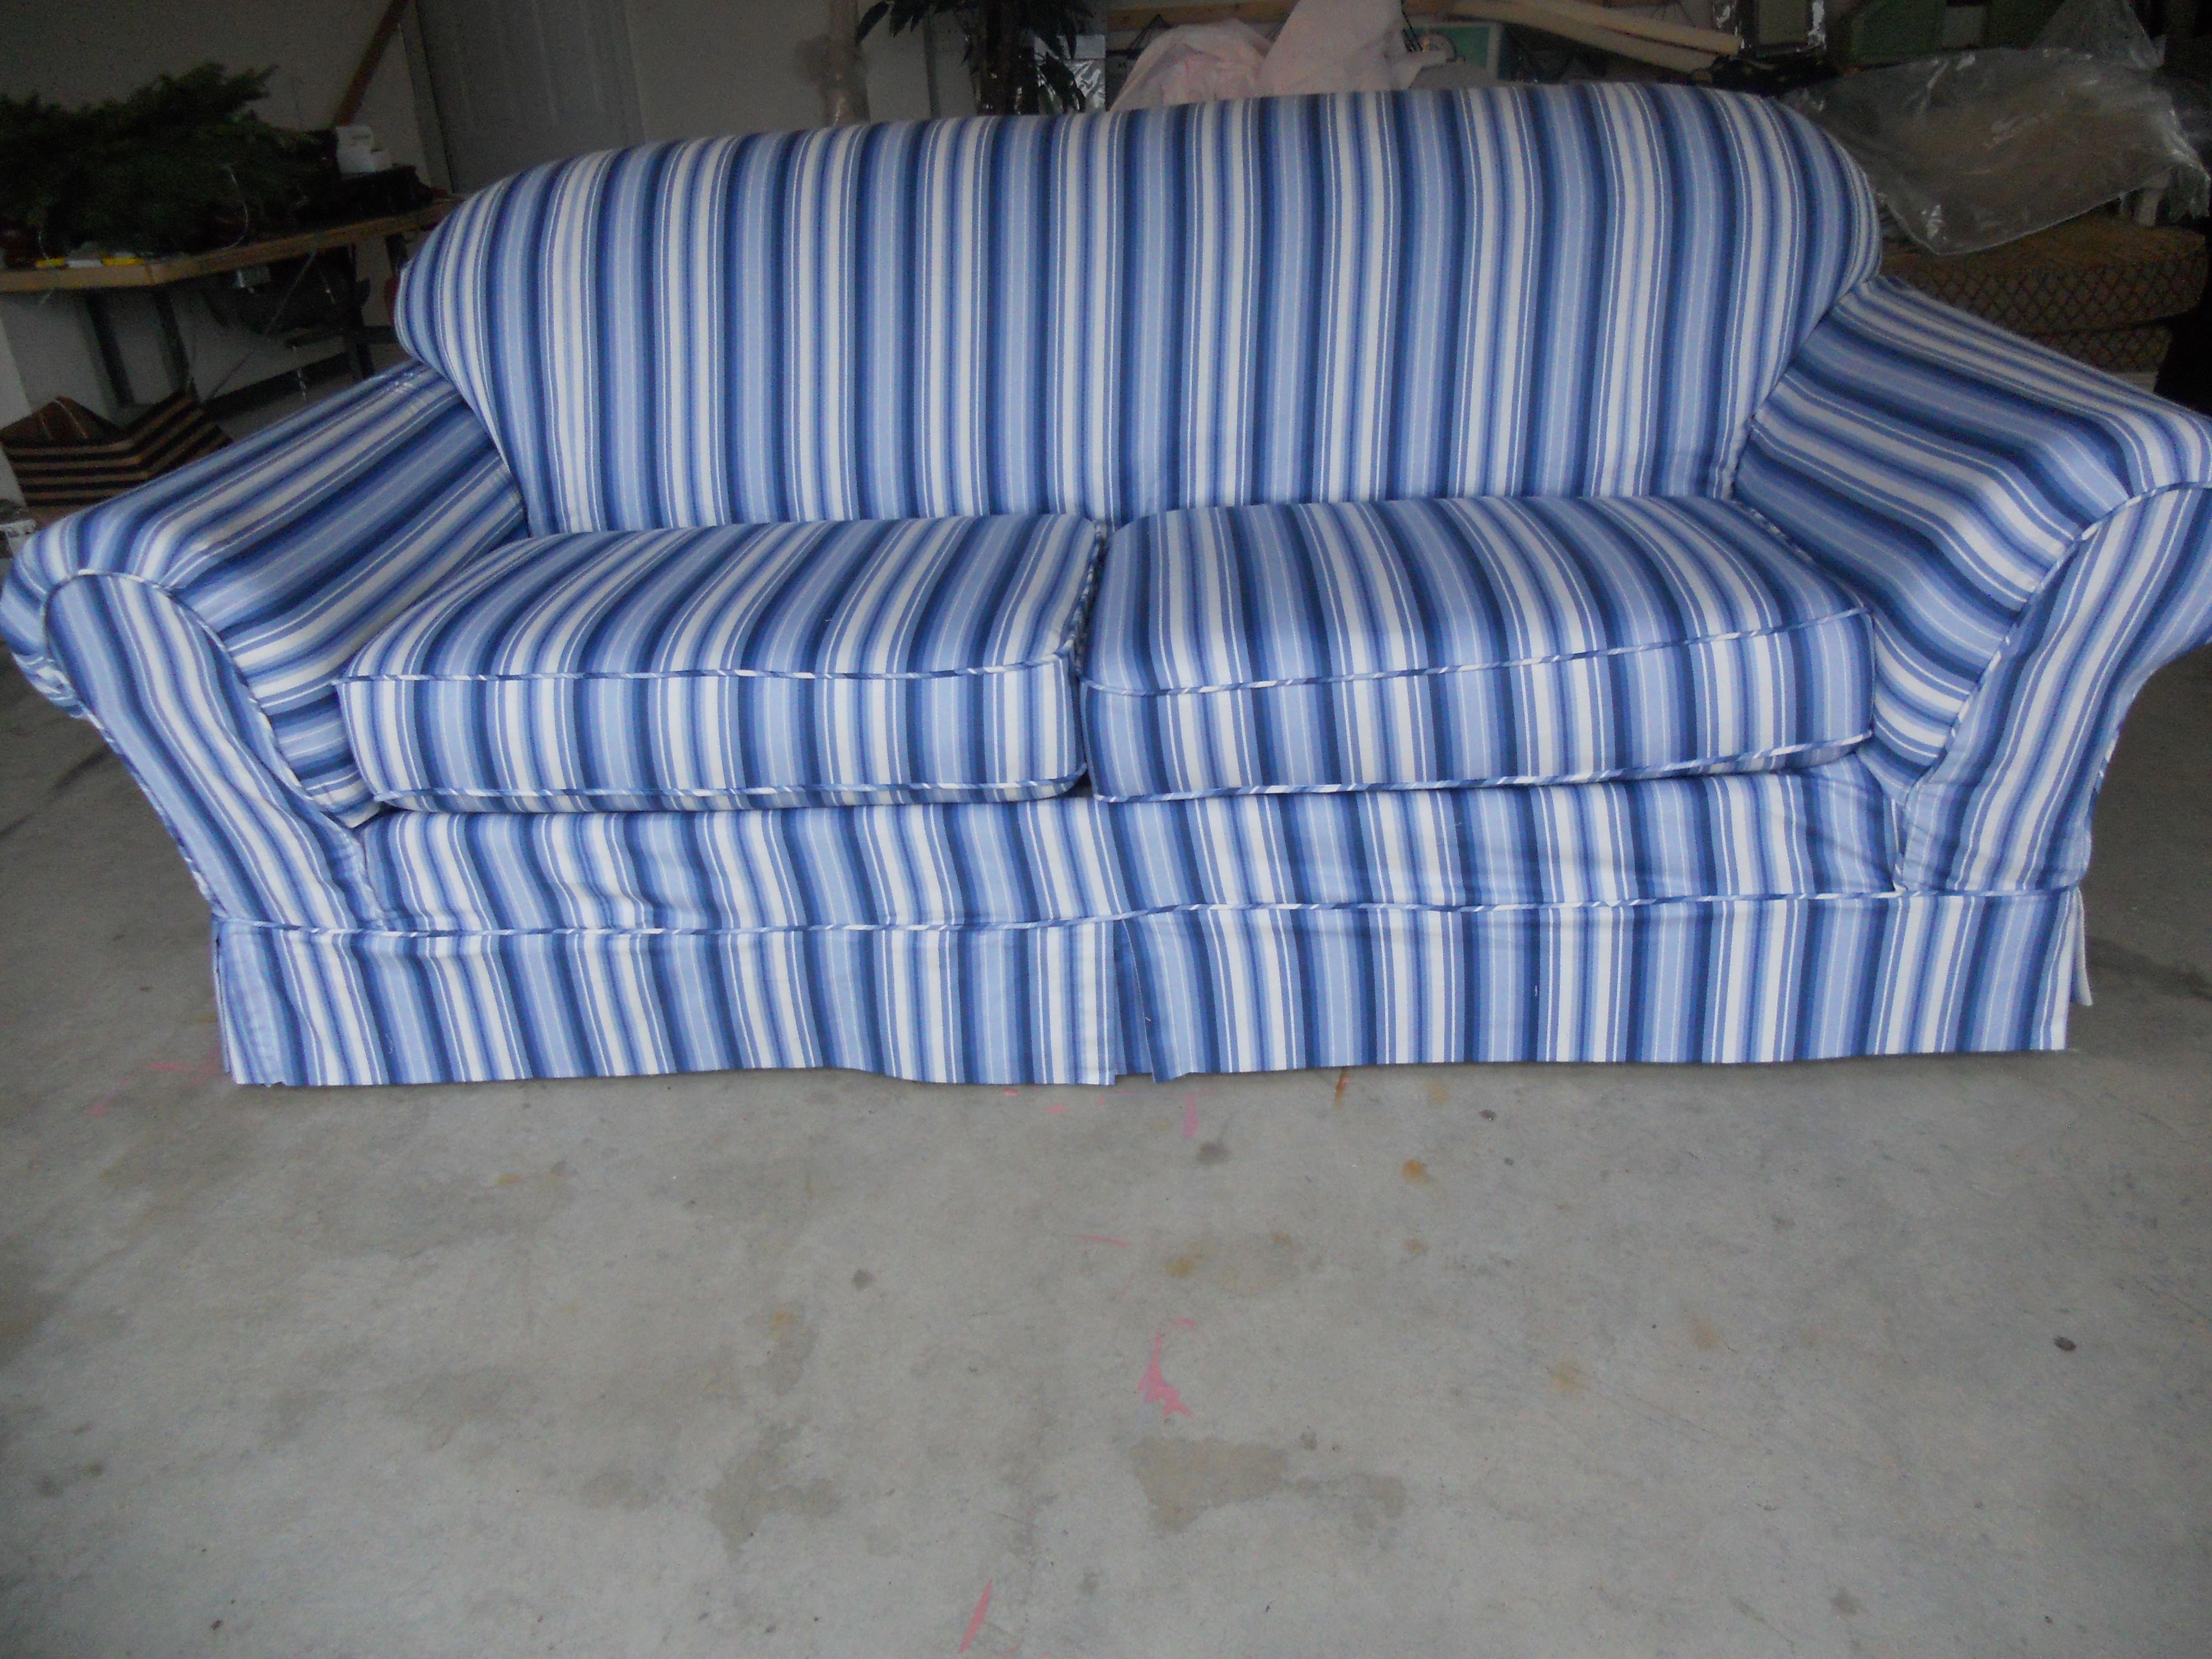 Blue White Striped Sofa Slipcover Striped Sofa Slipcovered Sofa Home Decor